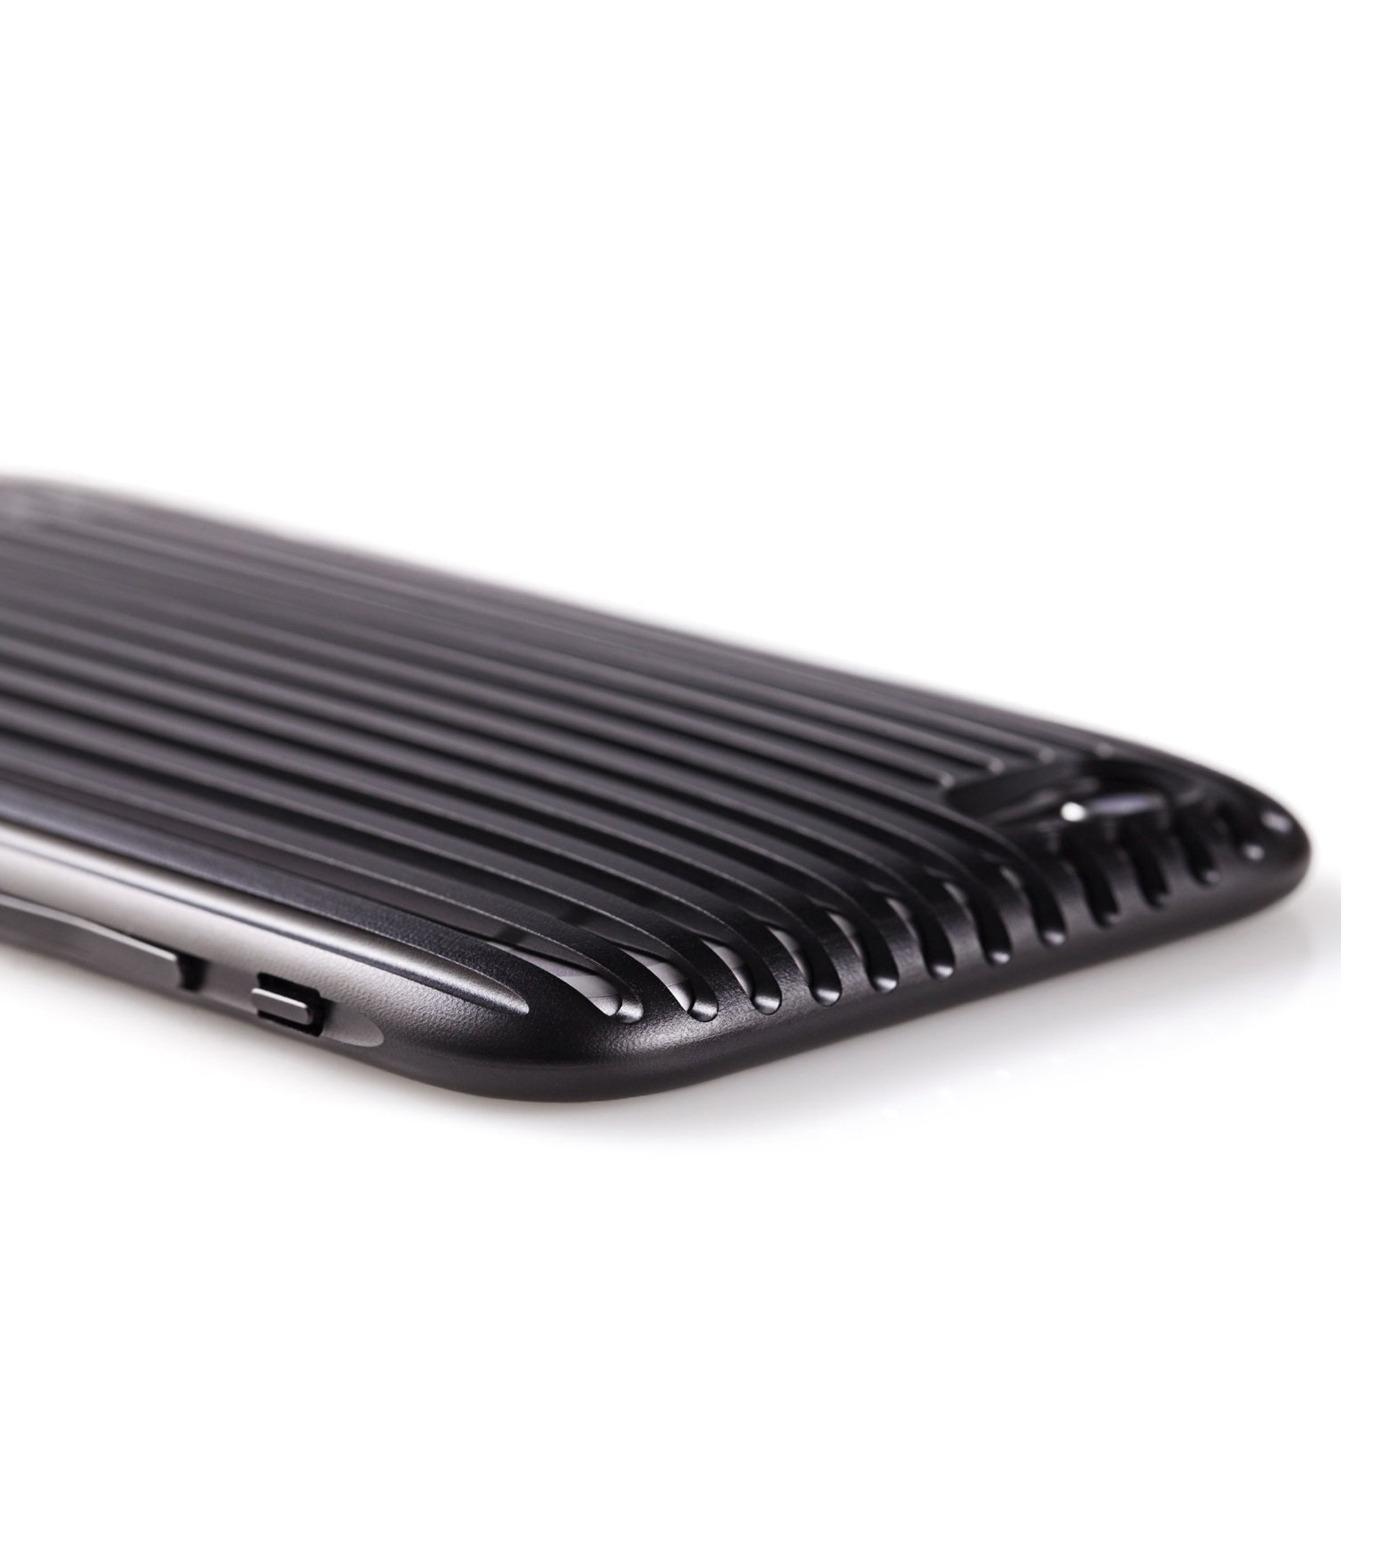 SQUAIR(スクエア)のThe Slit for iPhone6-BLACK(ケースiphone6/6s/case iphone6/6s)-SQSLT620-BLK-13 拡大詳細画像4